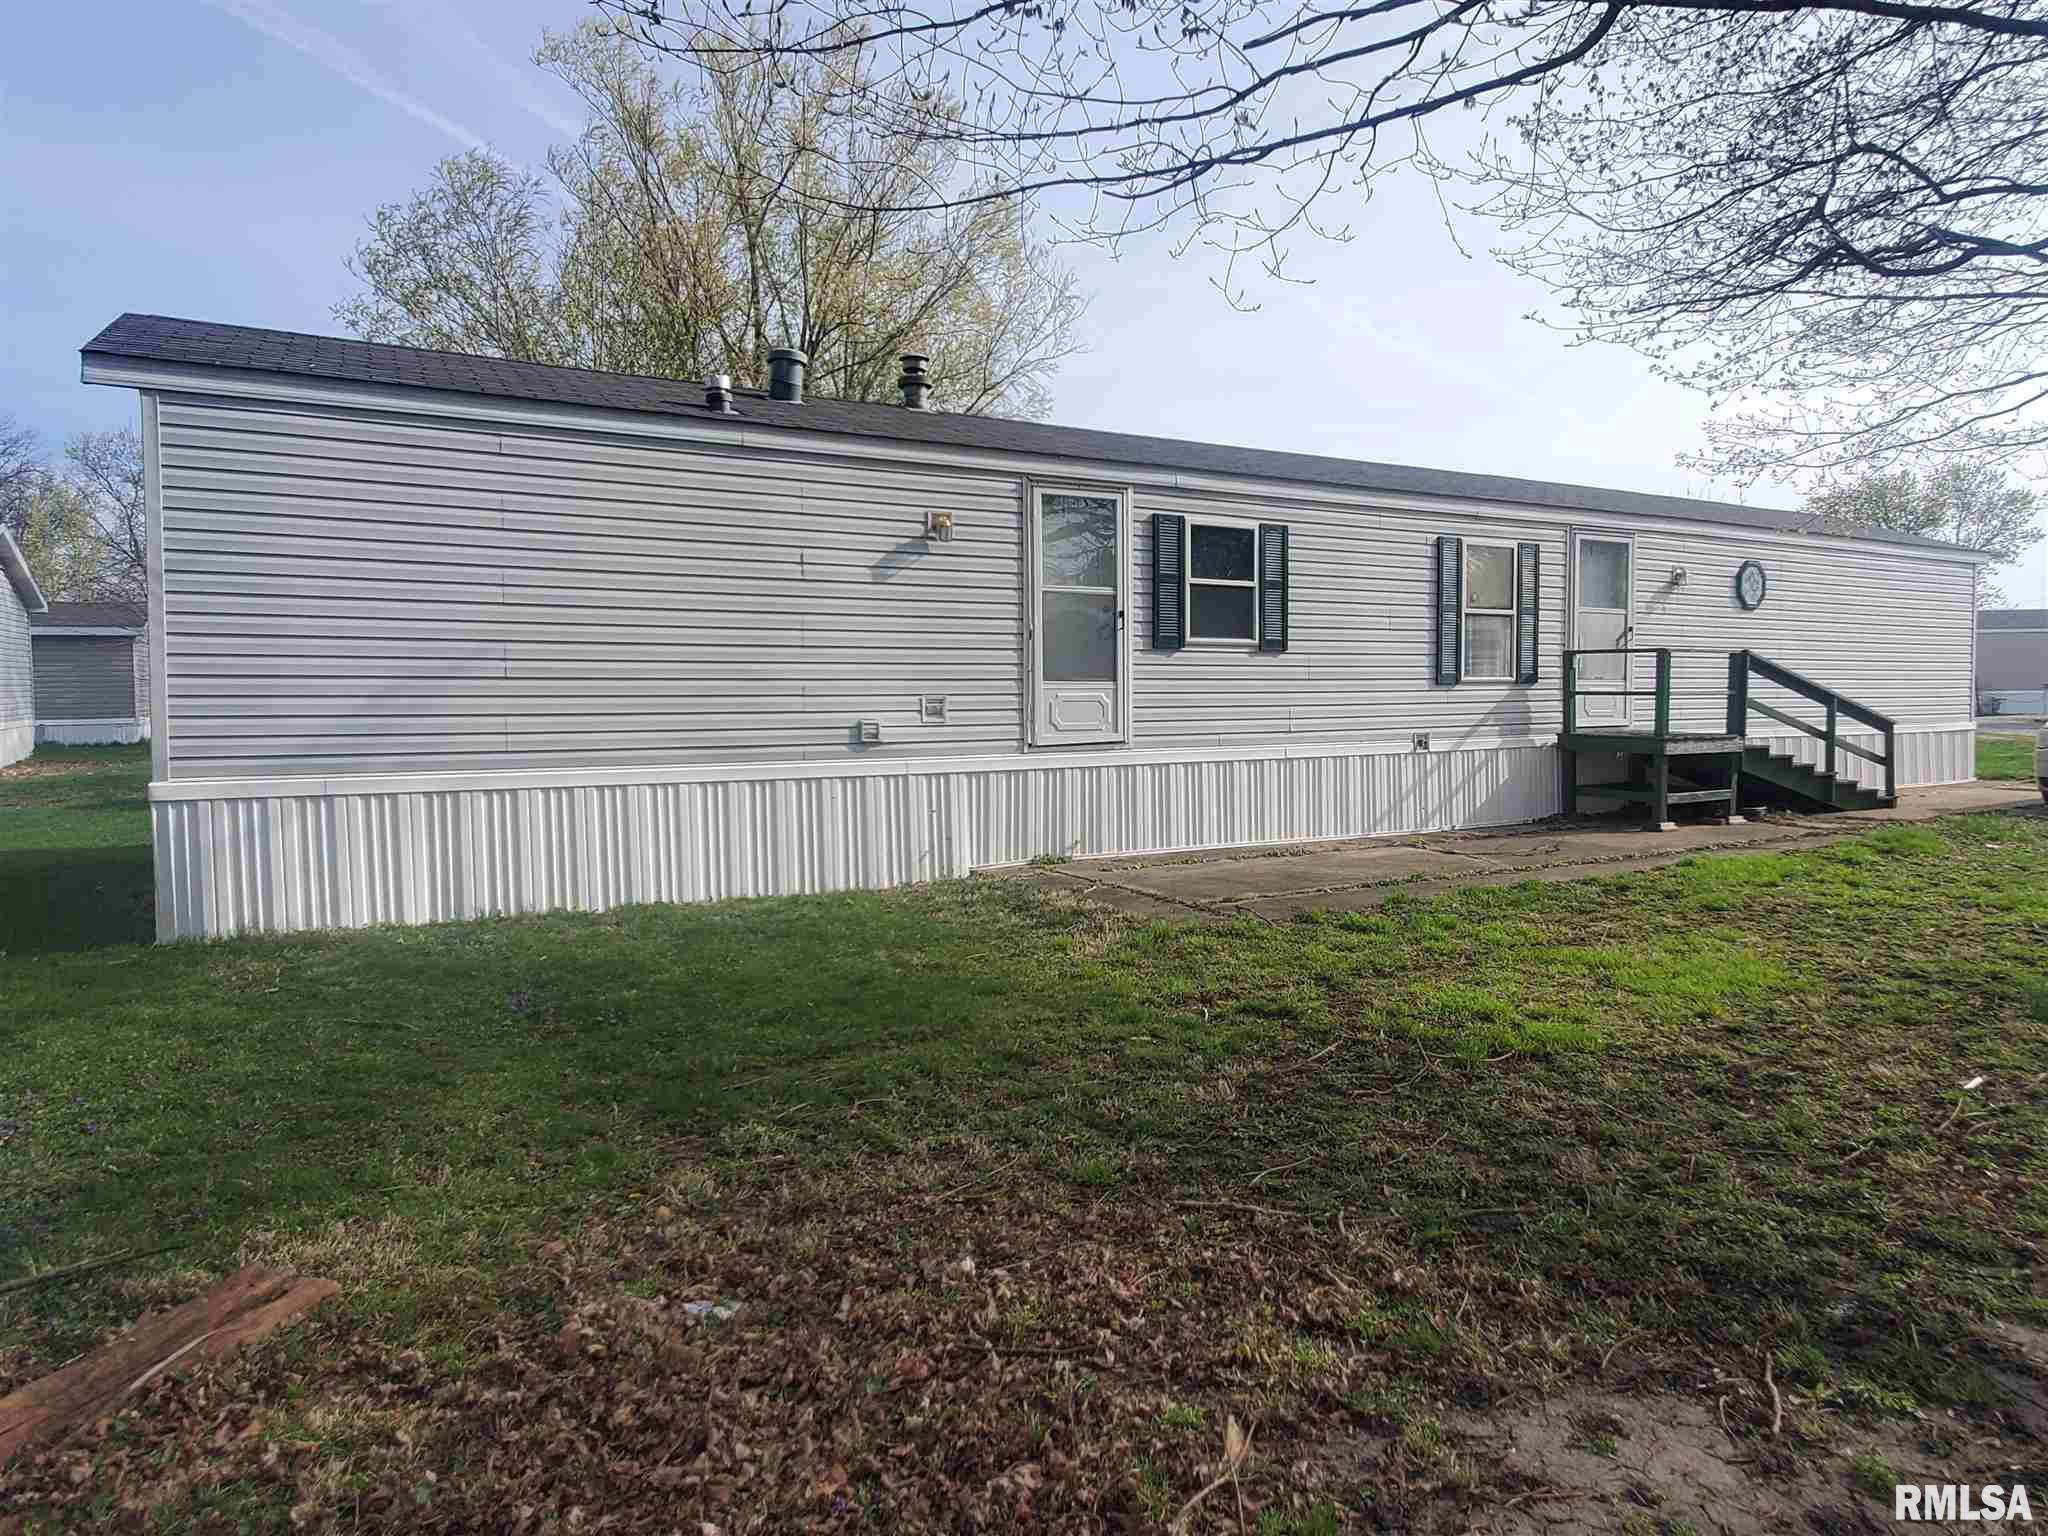 720 S CHURCH Property Photo - Ashland, IL real estate listing